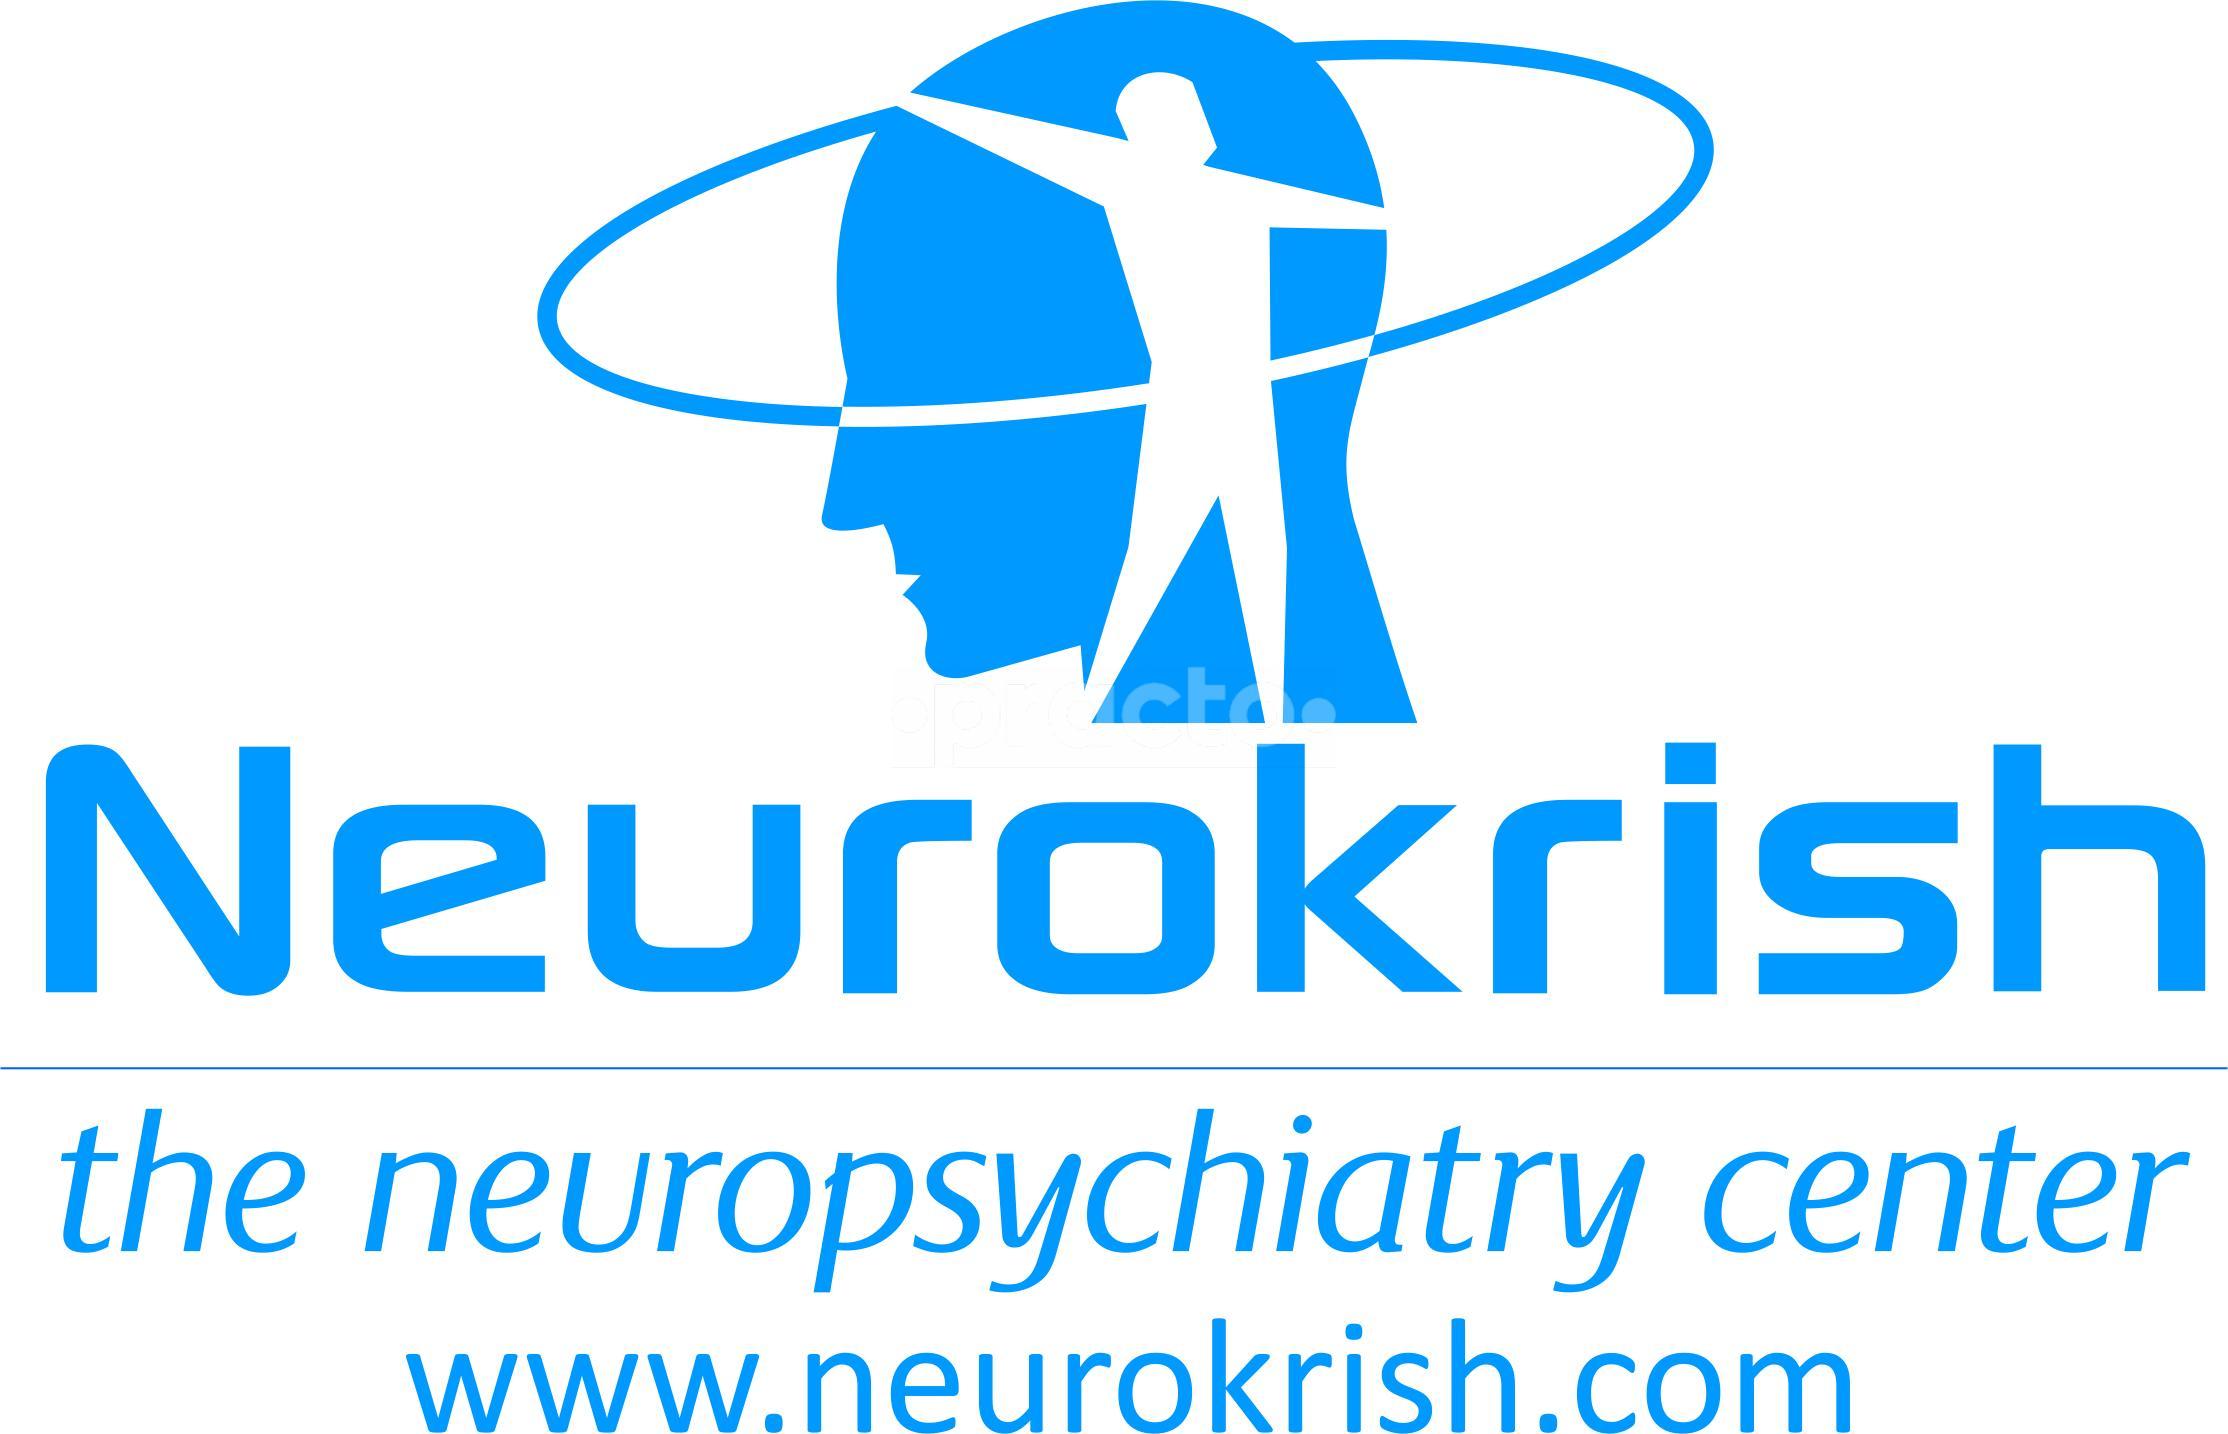 Neurokrish